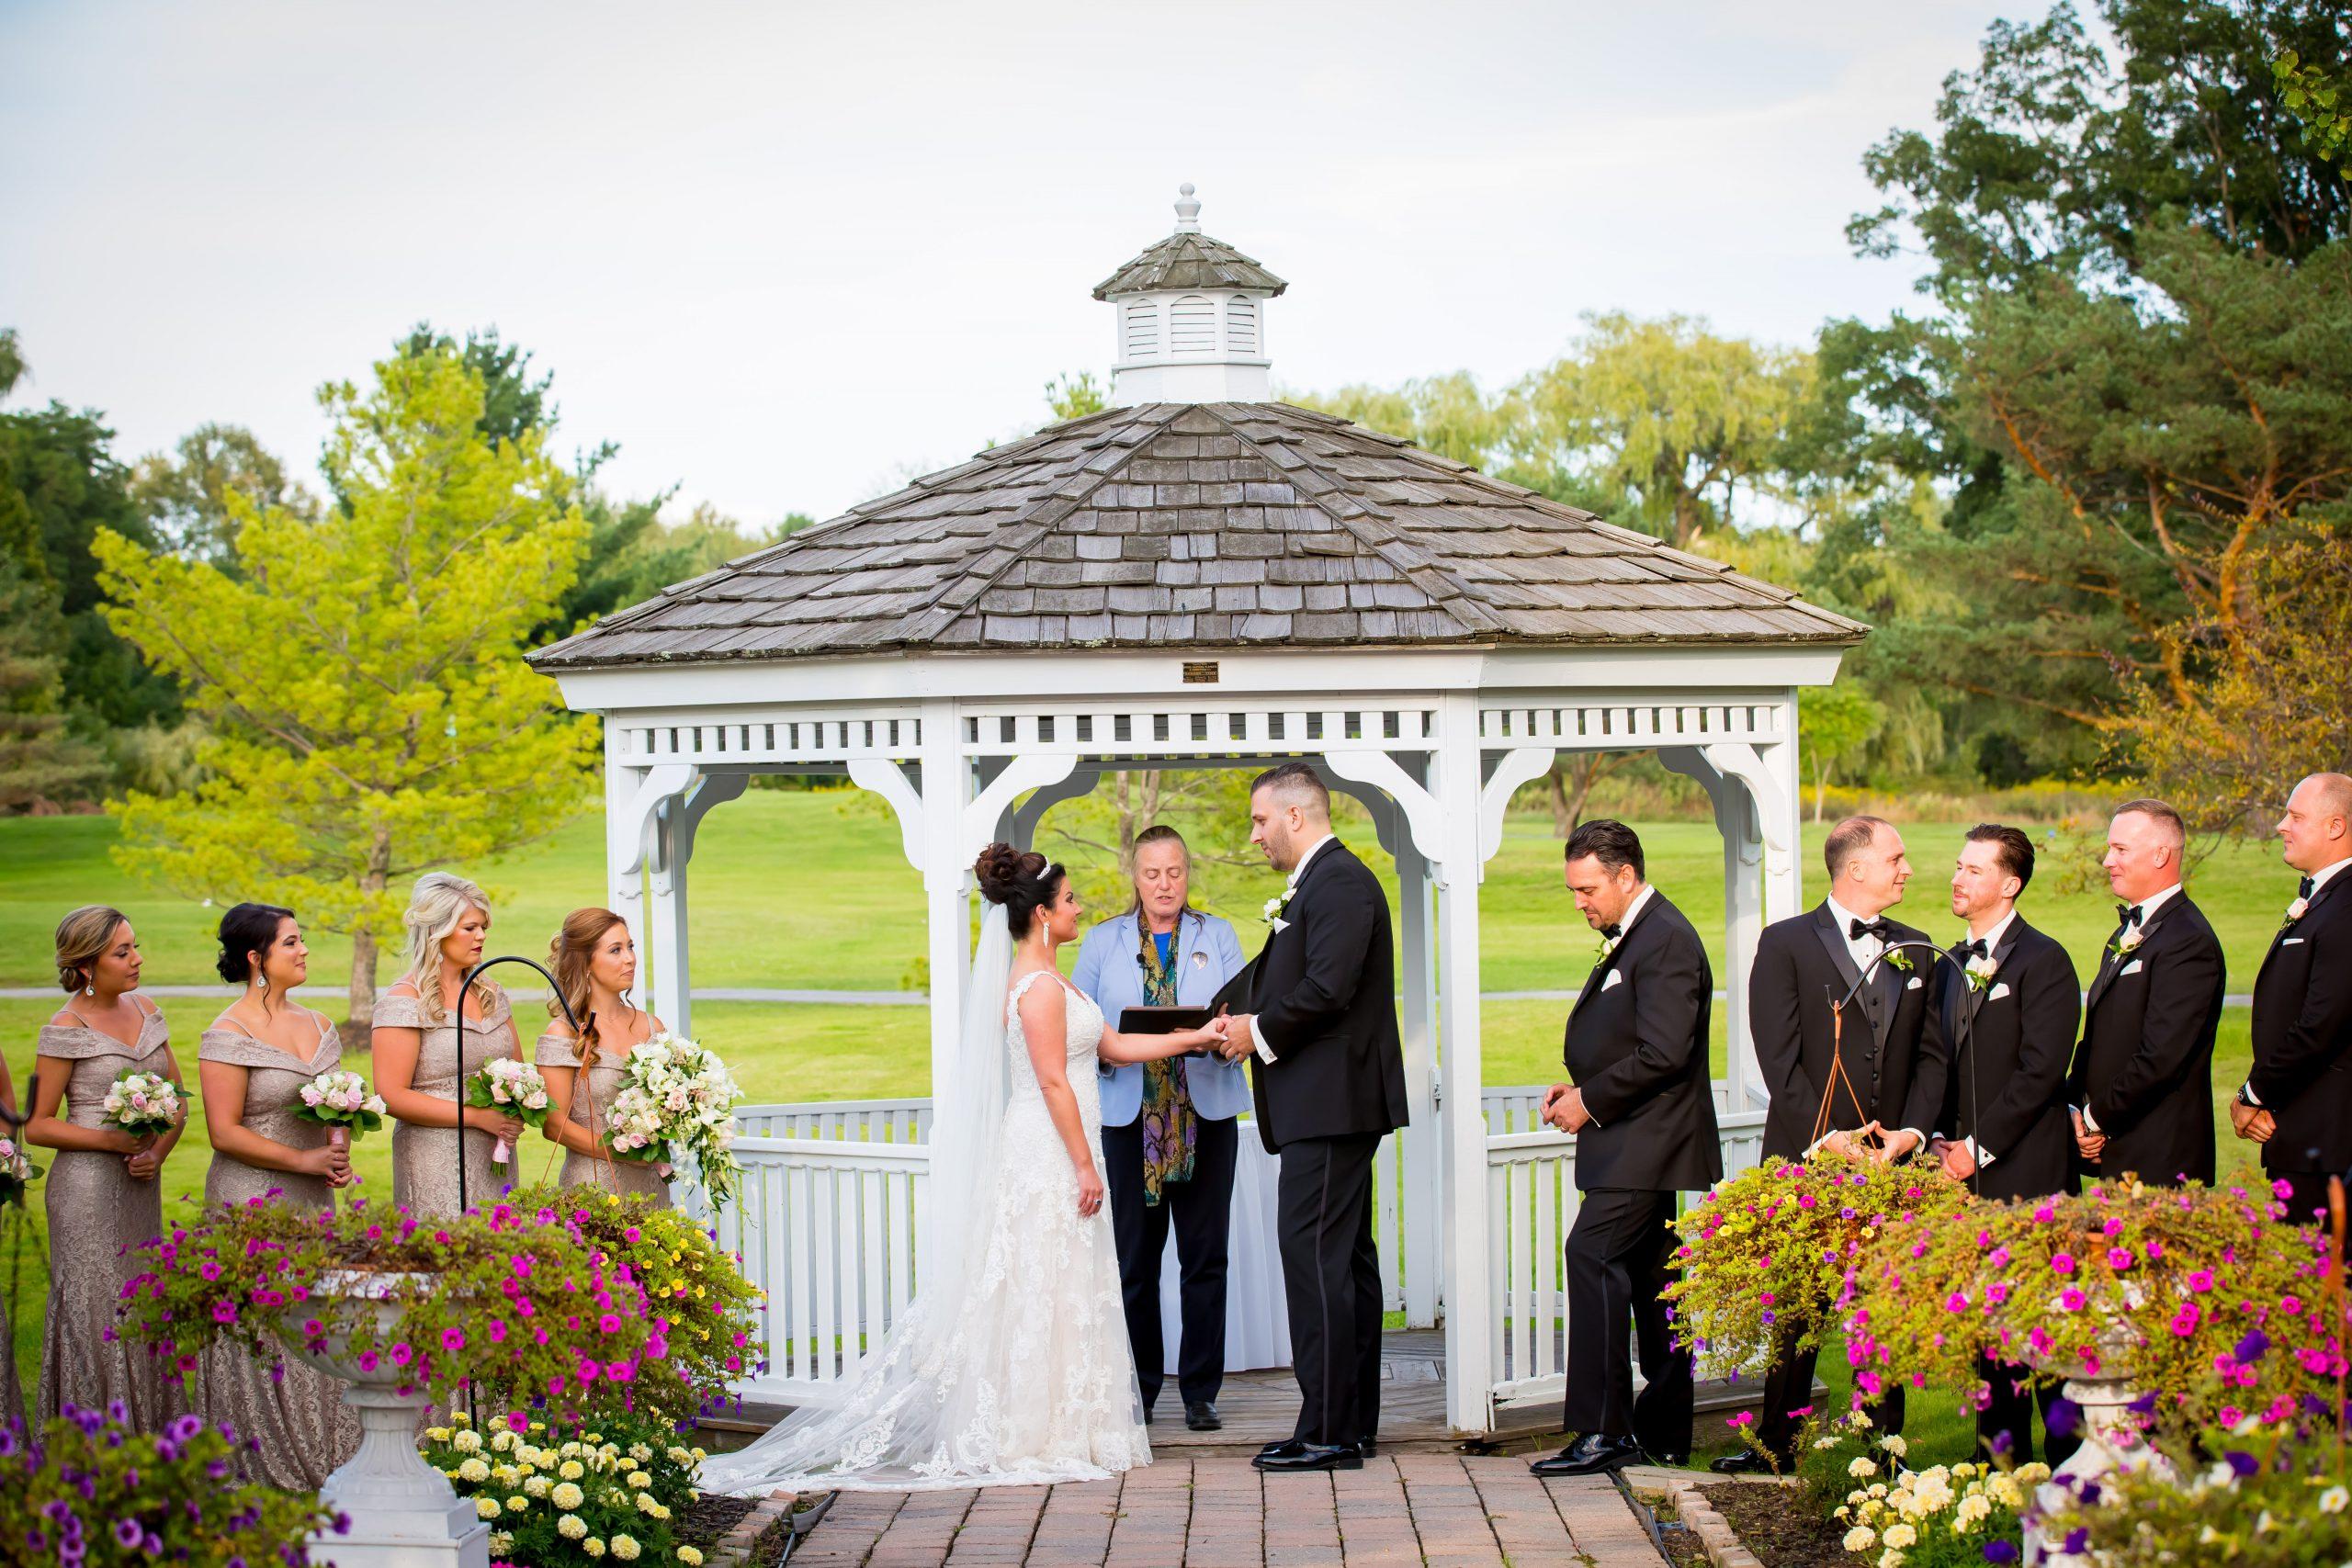 Victori_Rob_Mohawk River Country Club Wedding-30.jpg